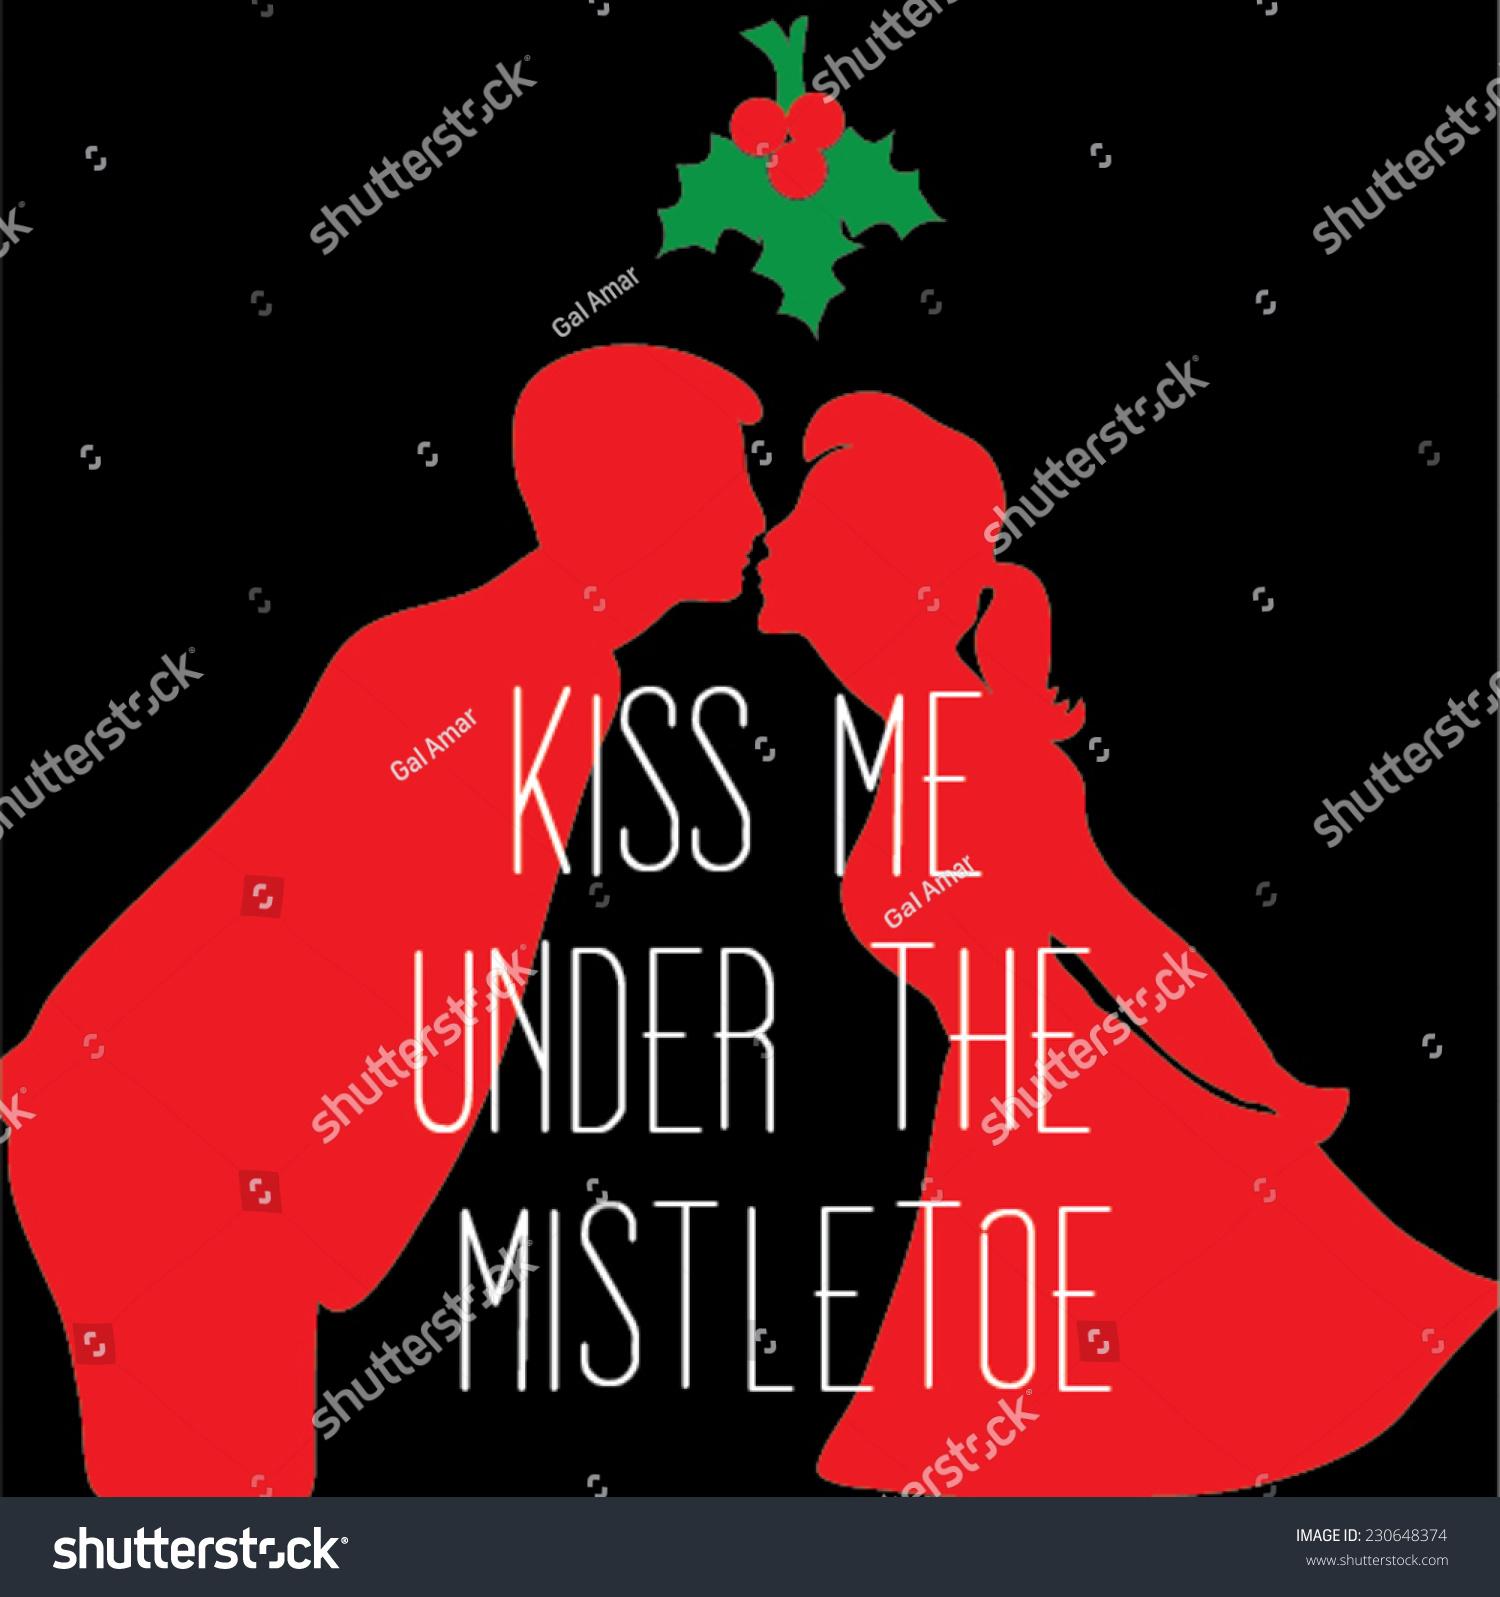 Kiss Me Under Mistletoe Man Woman Stock Vector 230648374 - Shutterstock